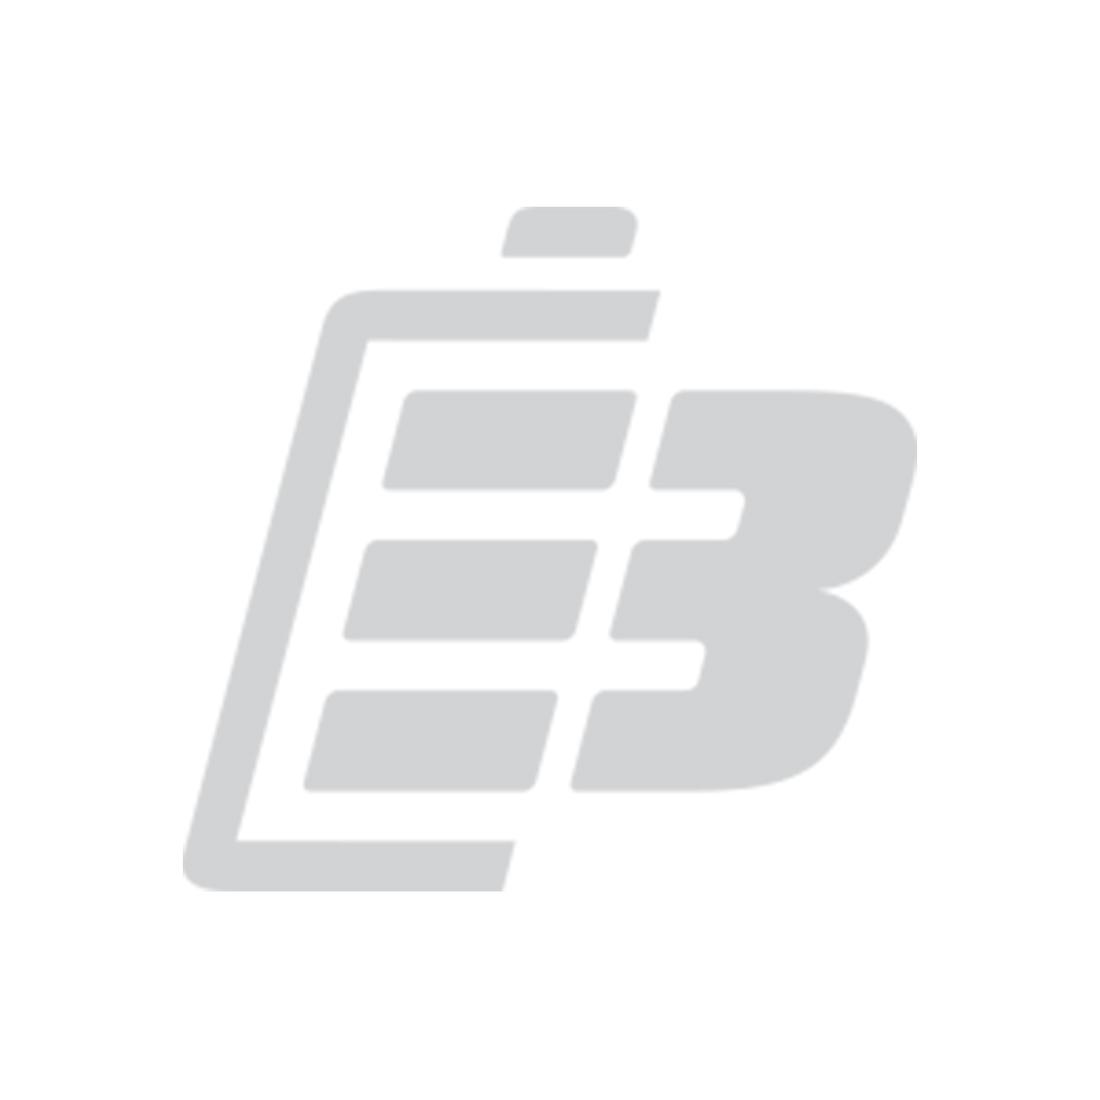 Panasonic NCR 18650 battery 3500mAh 10A